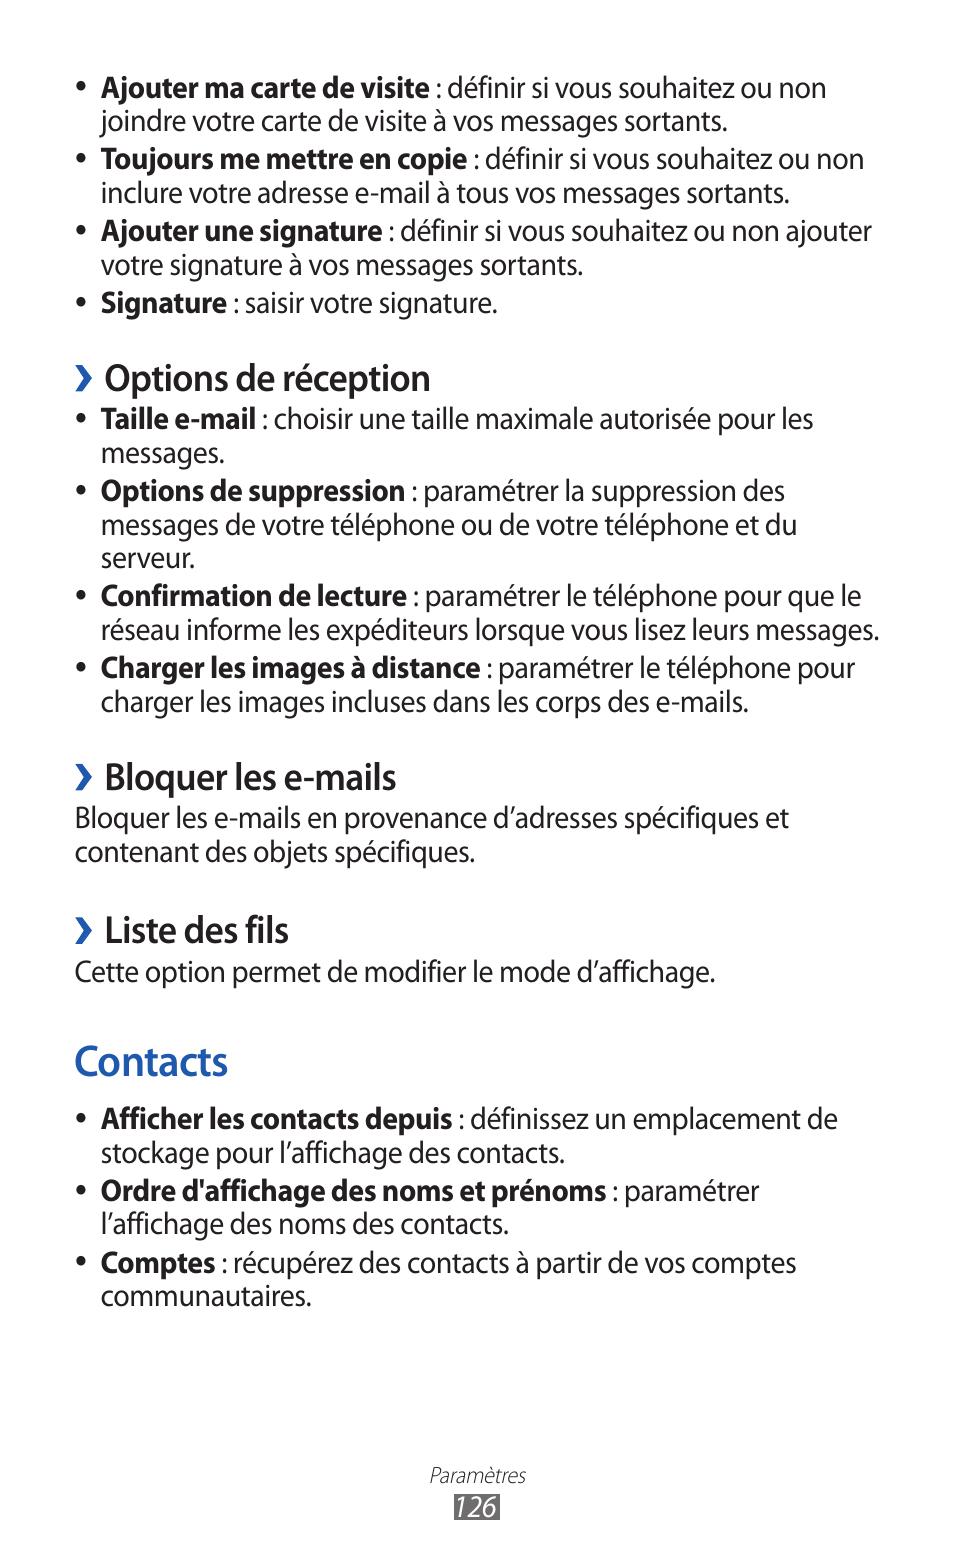 Contacts Options De Reception Bloquer Les E Mails